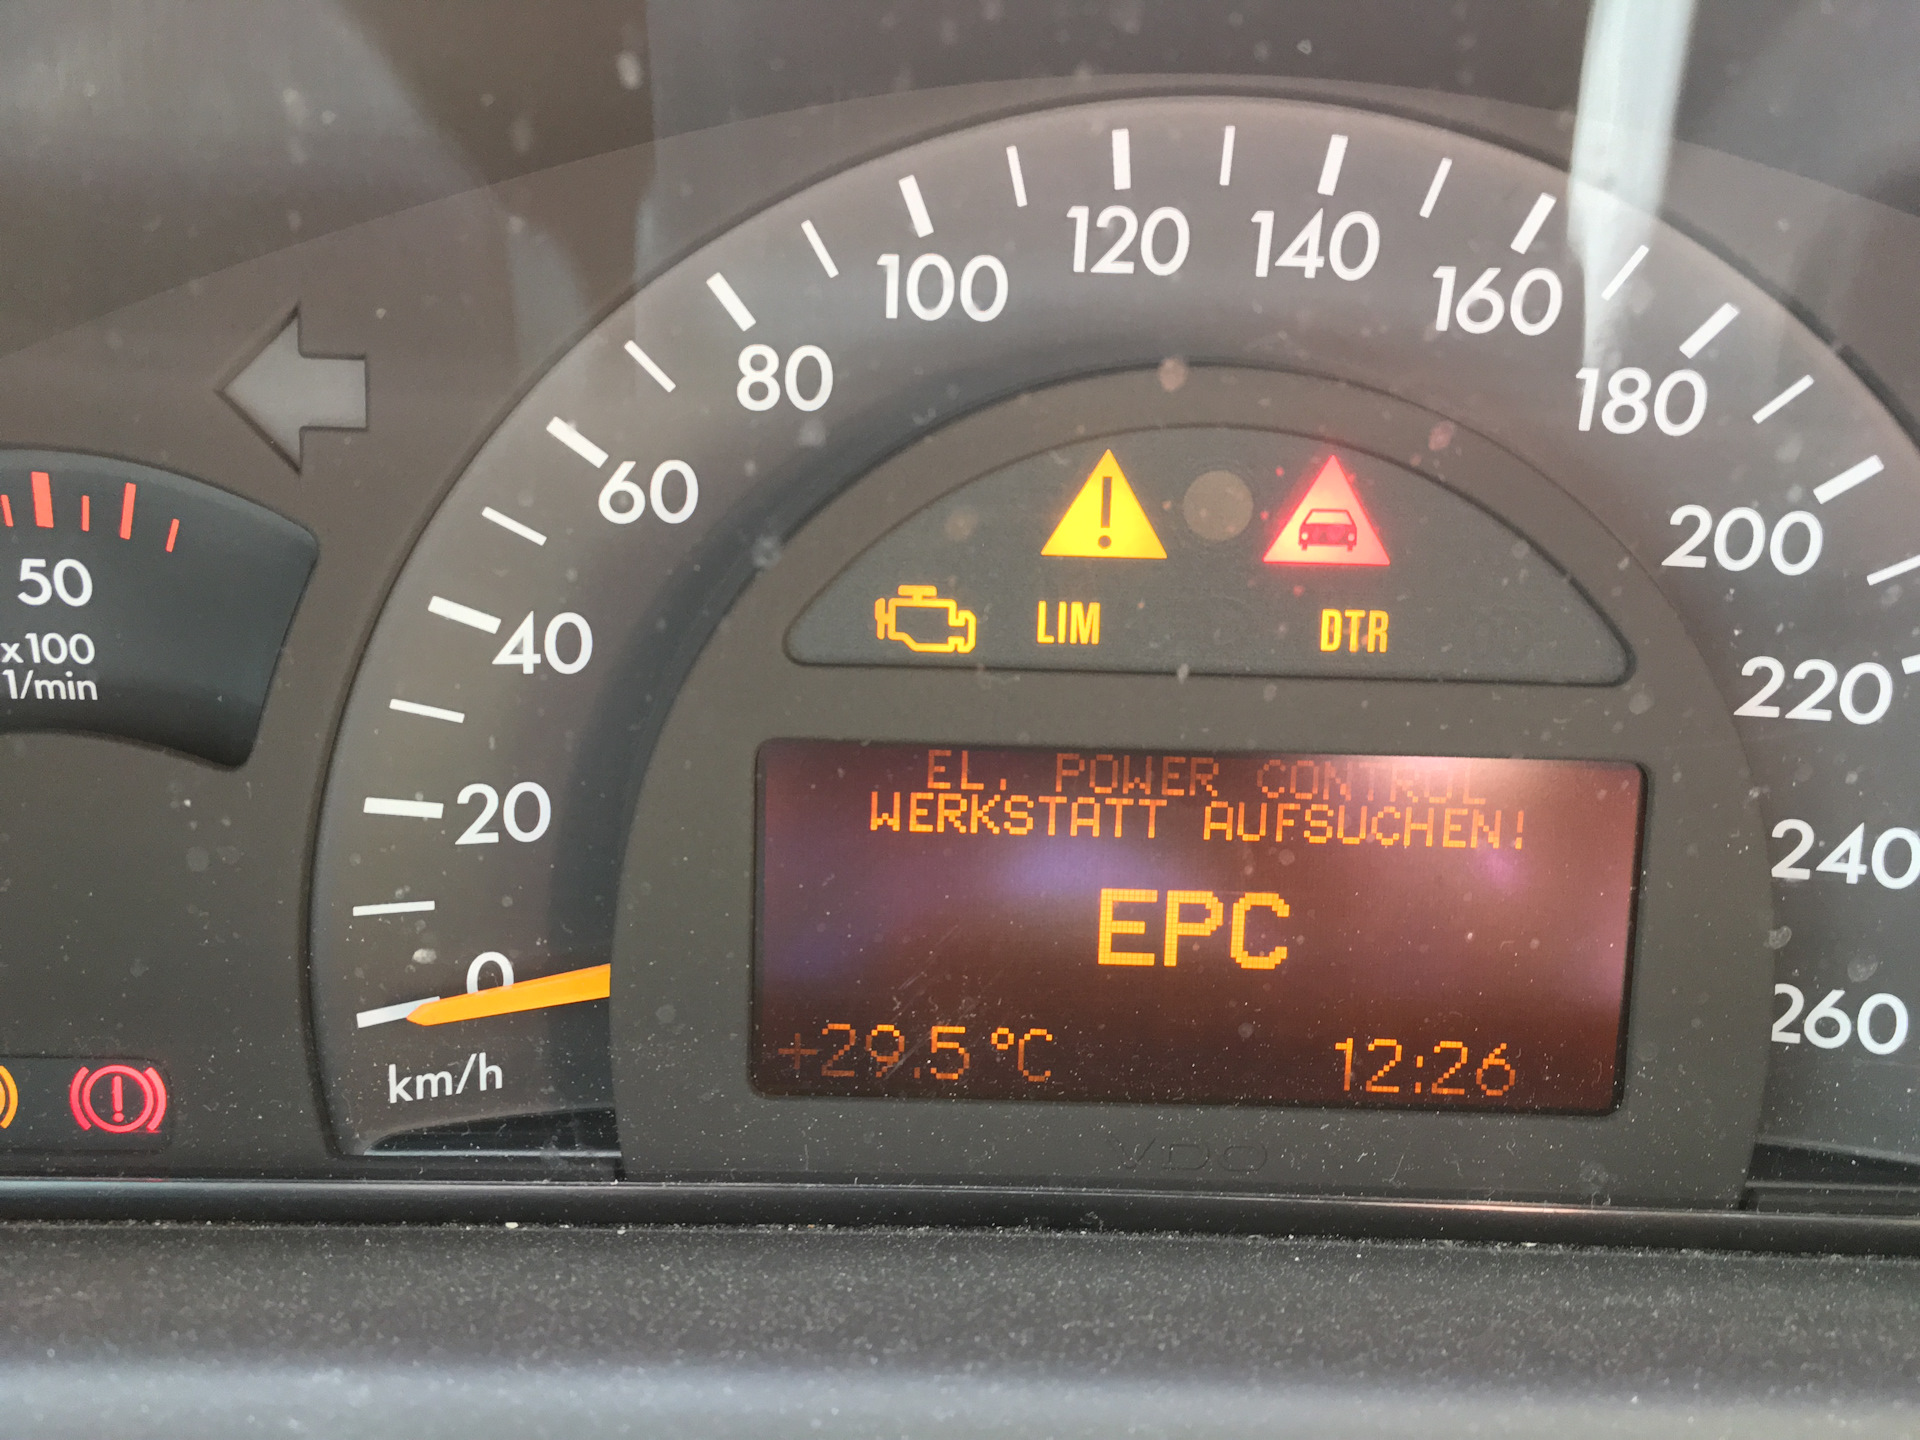 EPC нужна помощь! — Mercedes-Benz C-class, 2 2 л , 2000 года